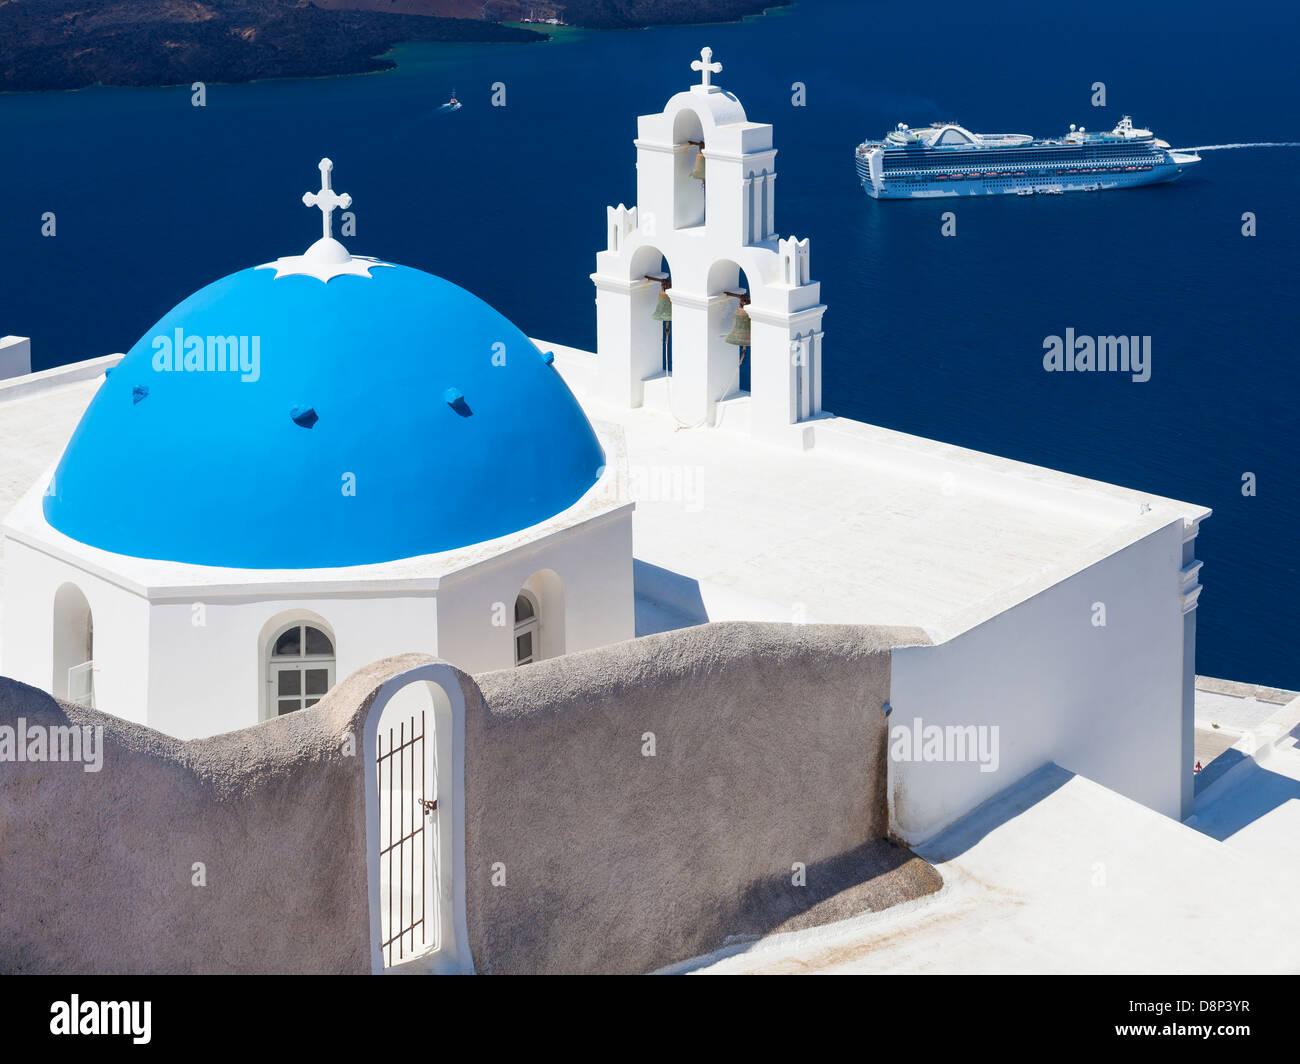 Blue Dome Church at Firostefani near Fira on Thira Island Santorini Greece - Stock Image